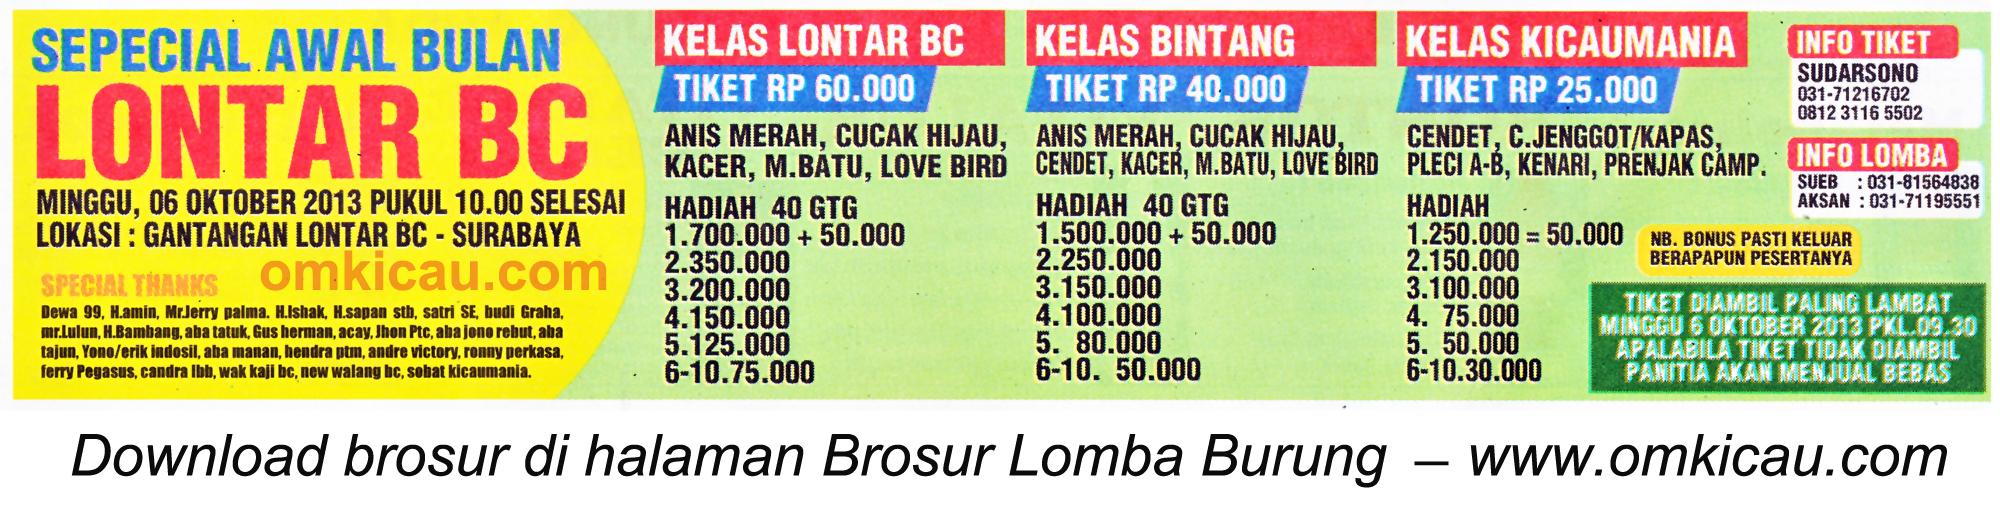 Brosur Lomba Burung Berkicau Lontar BC Surabaya 6 Oktober 2013